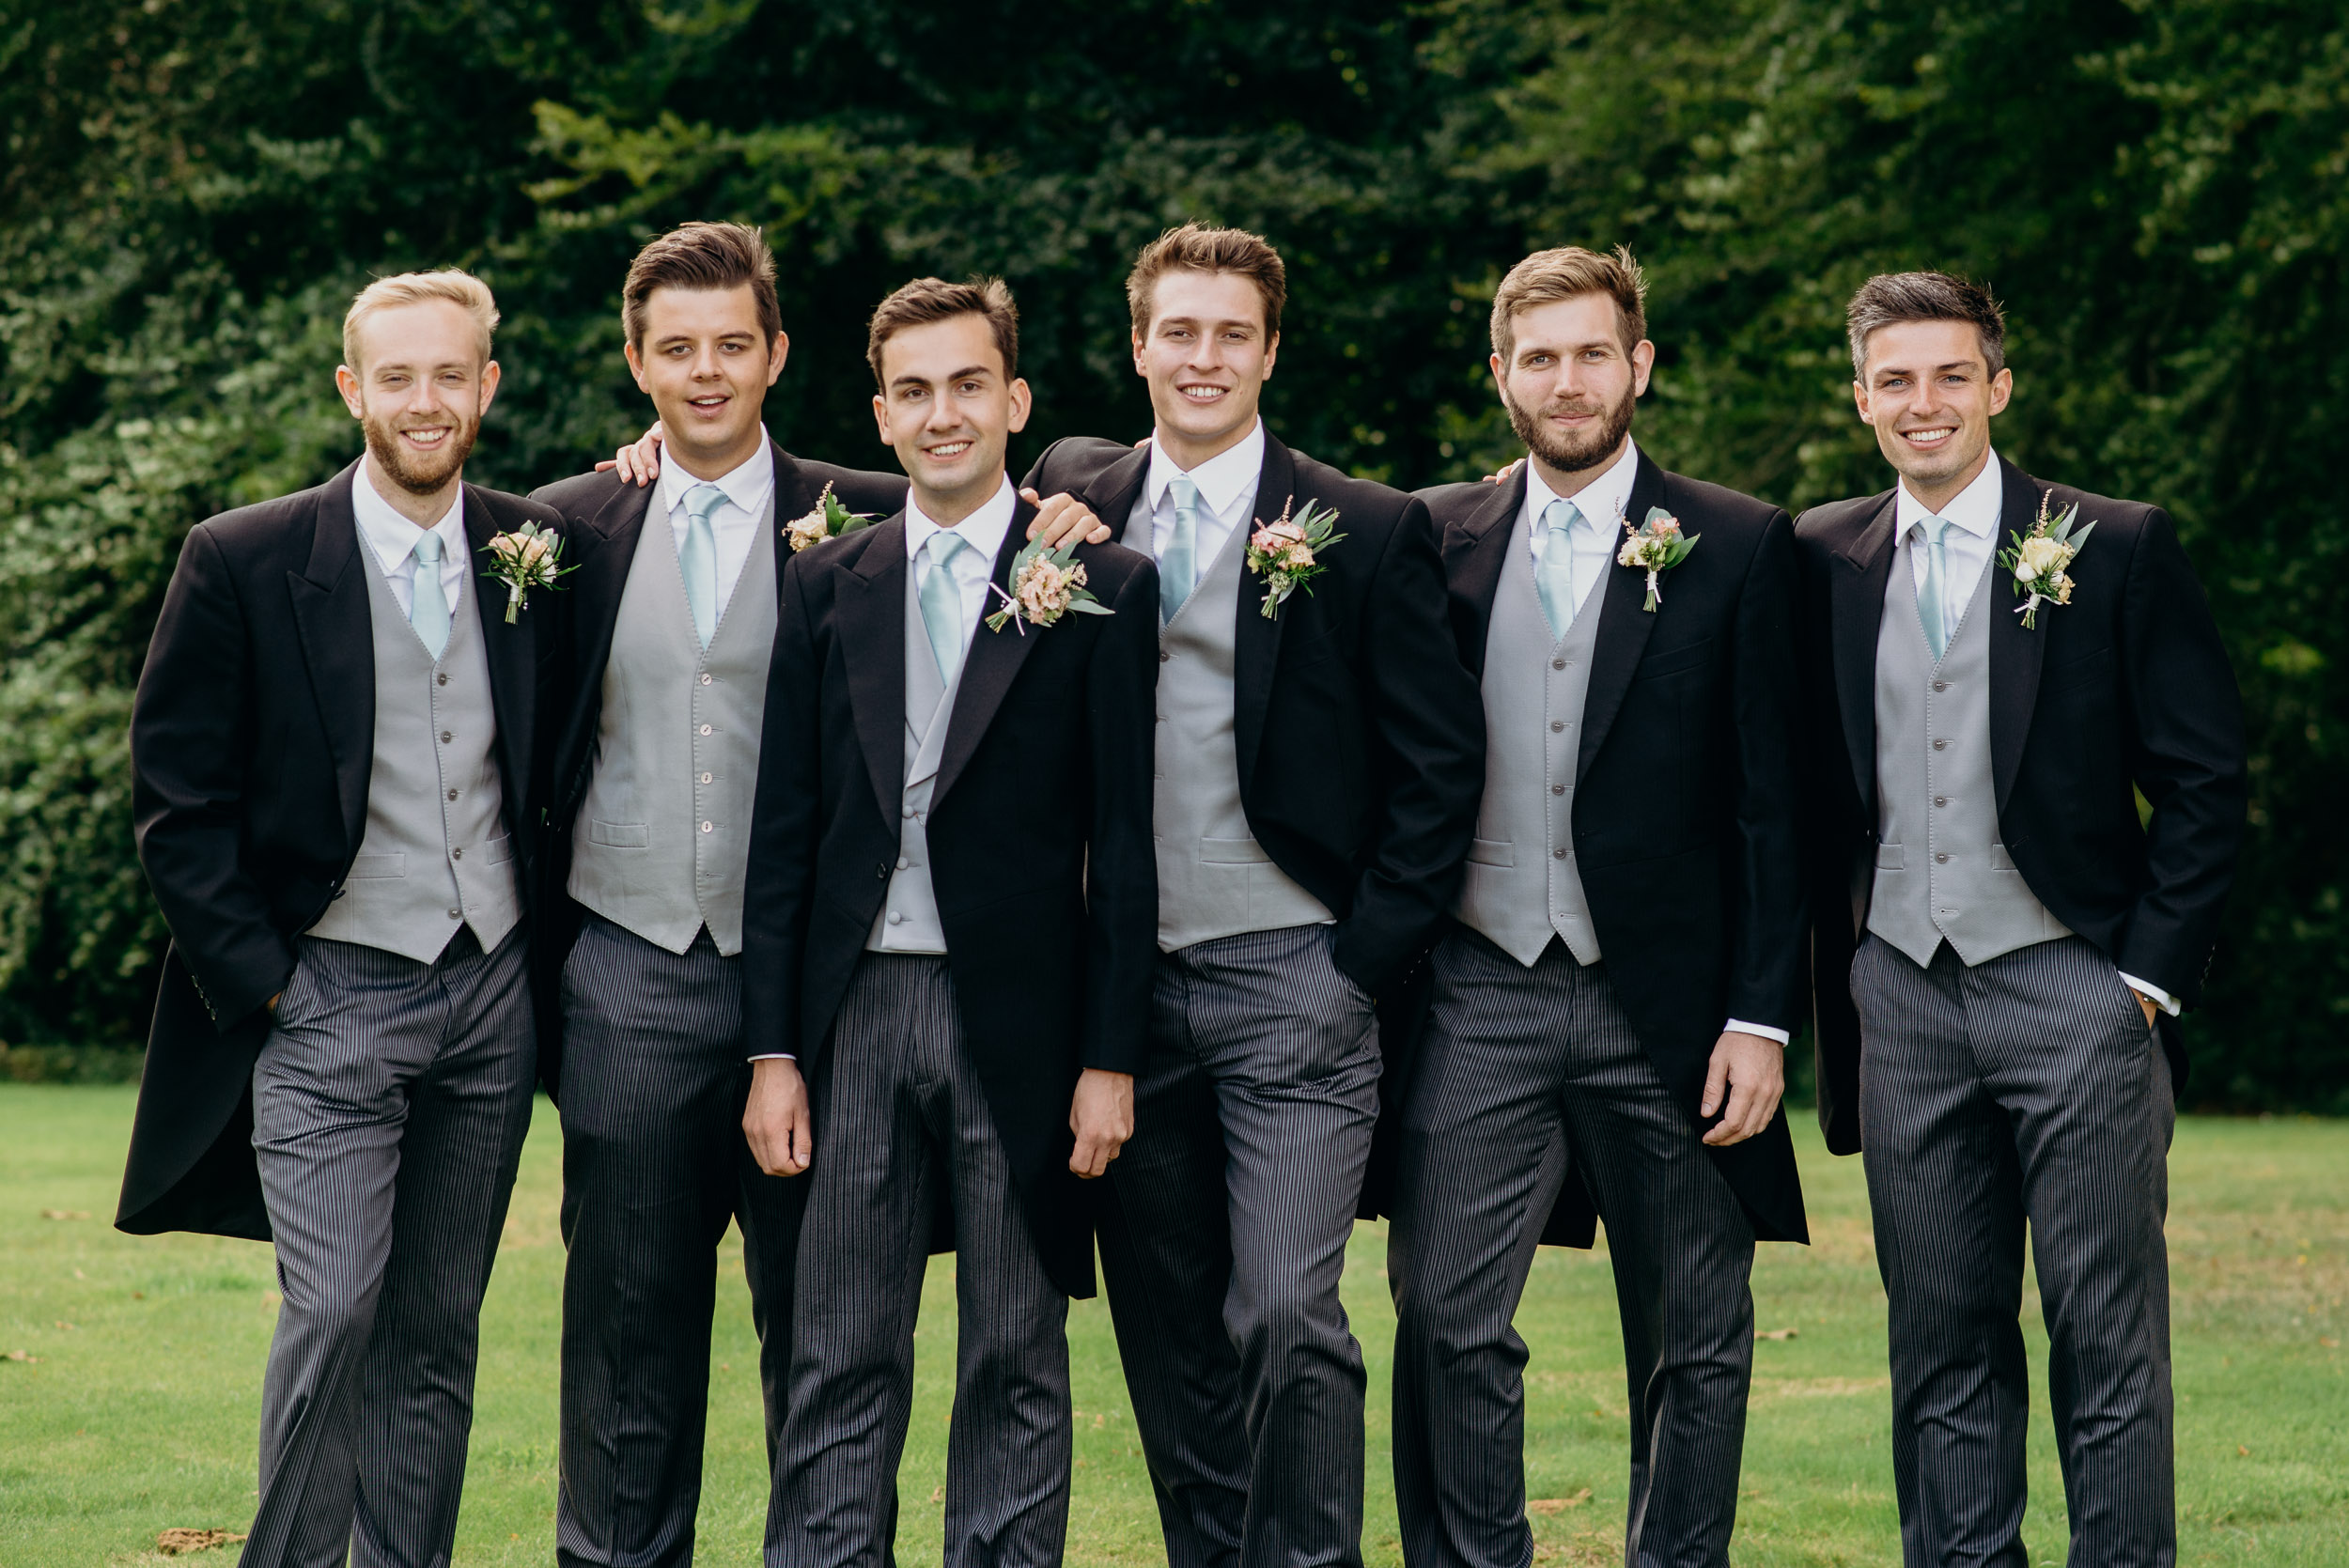 drenagh estate wedding photography-72.jpg